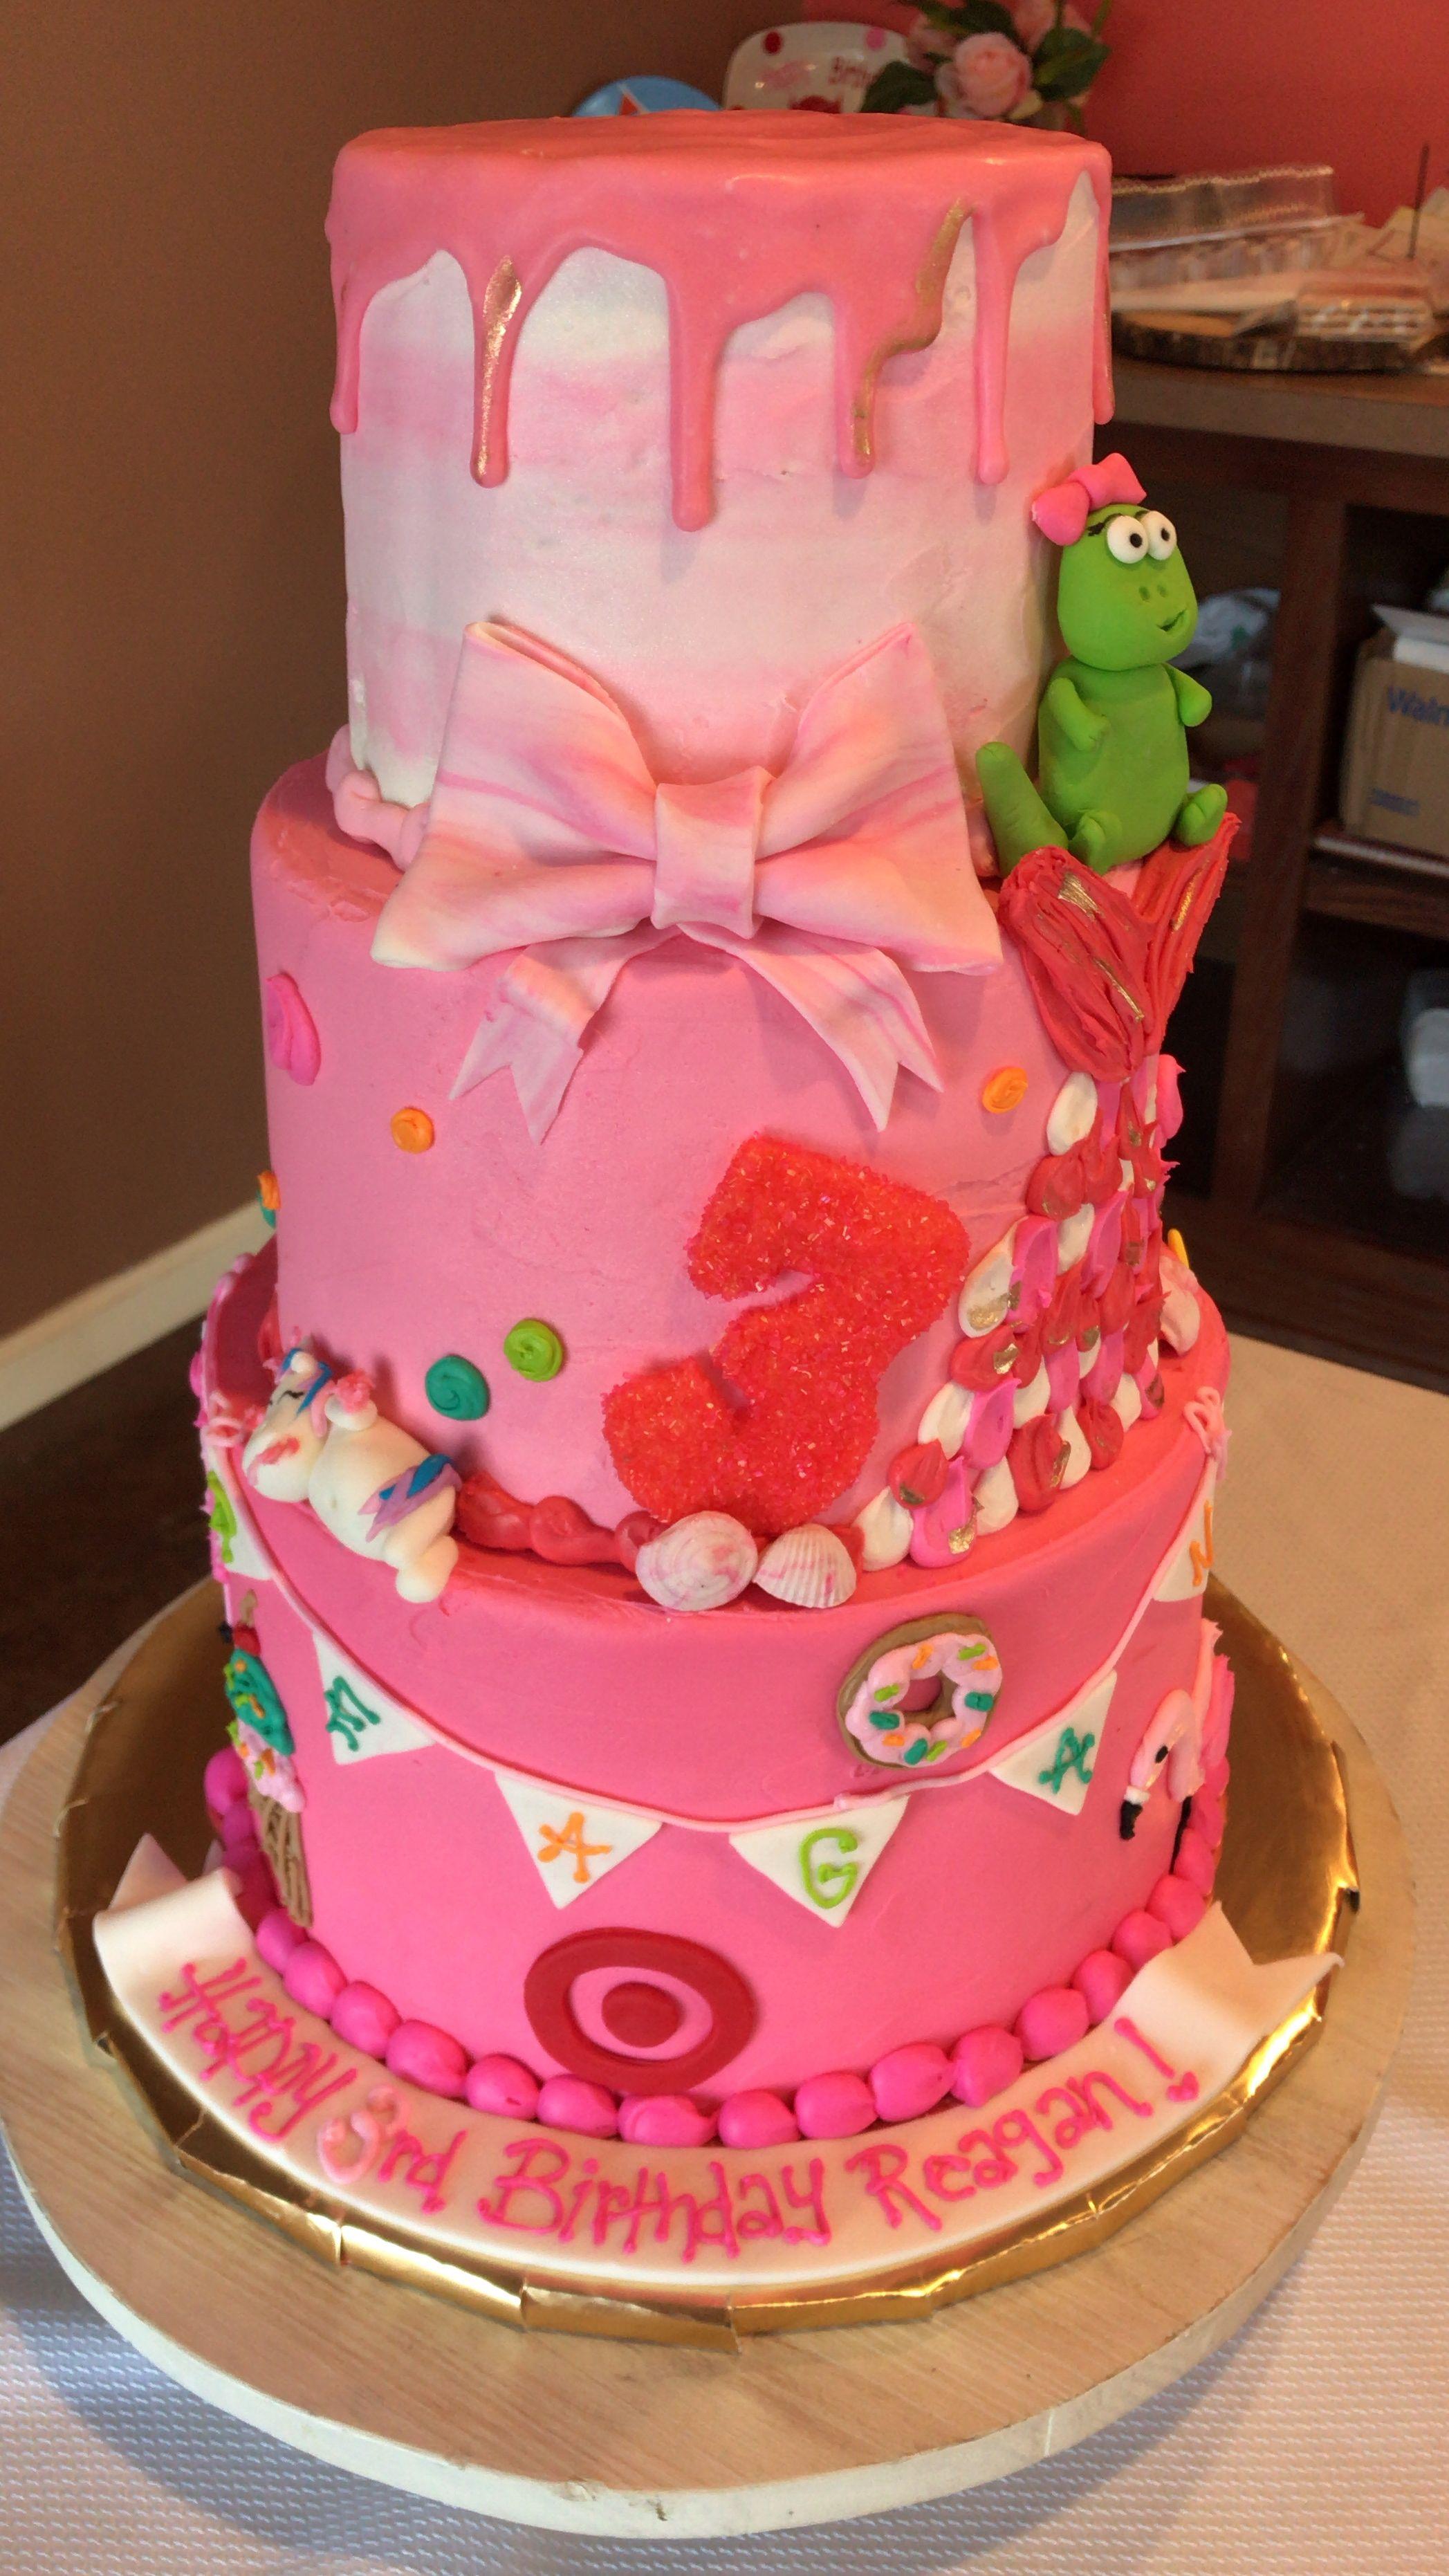 Surprising Ultimate Girl Pink Girly Tier Cake Peppa Pig Target Donut Icecream Funny Birthday Cards Online Unhofree Goldxyz